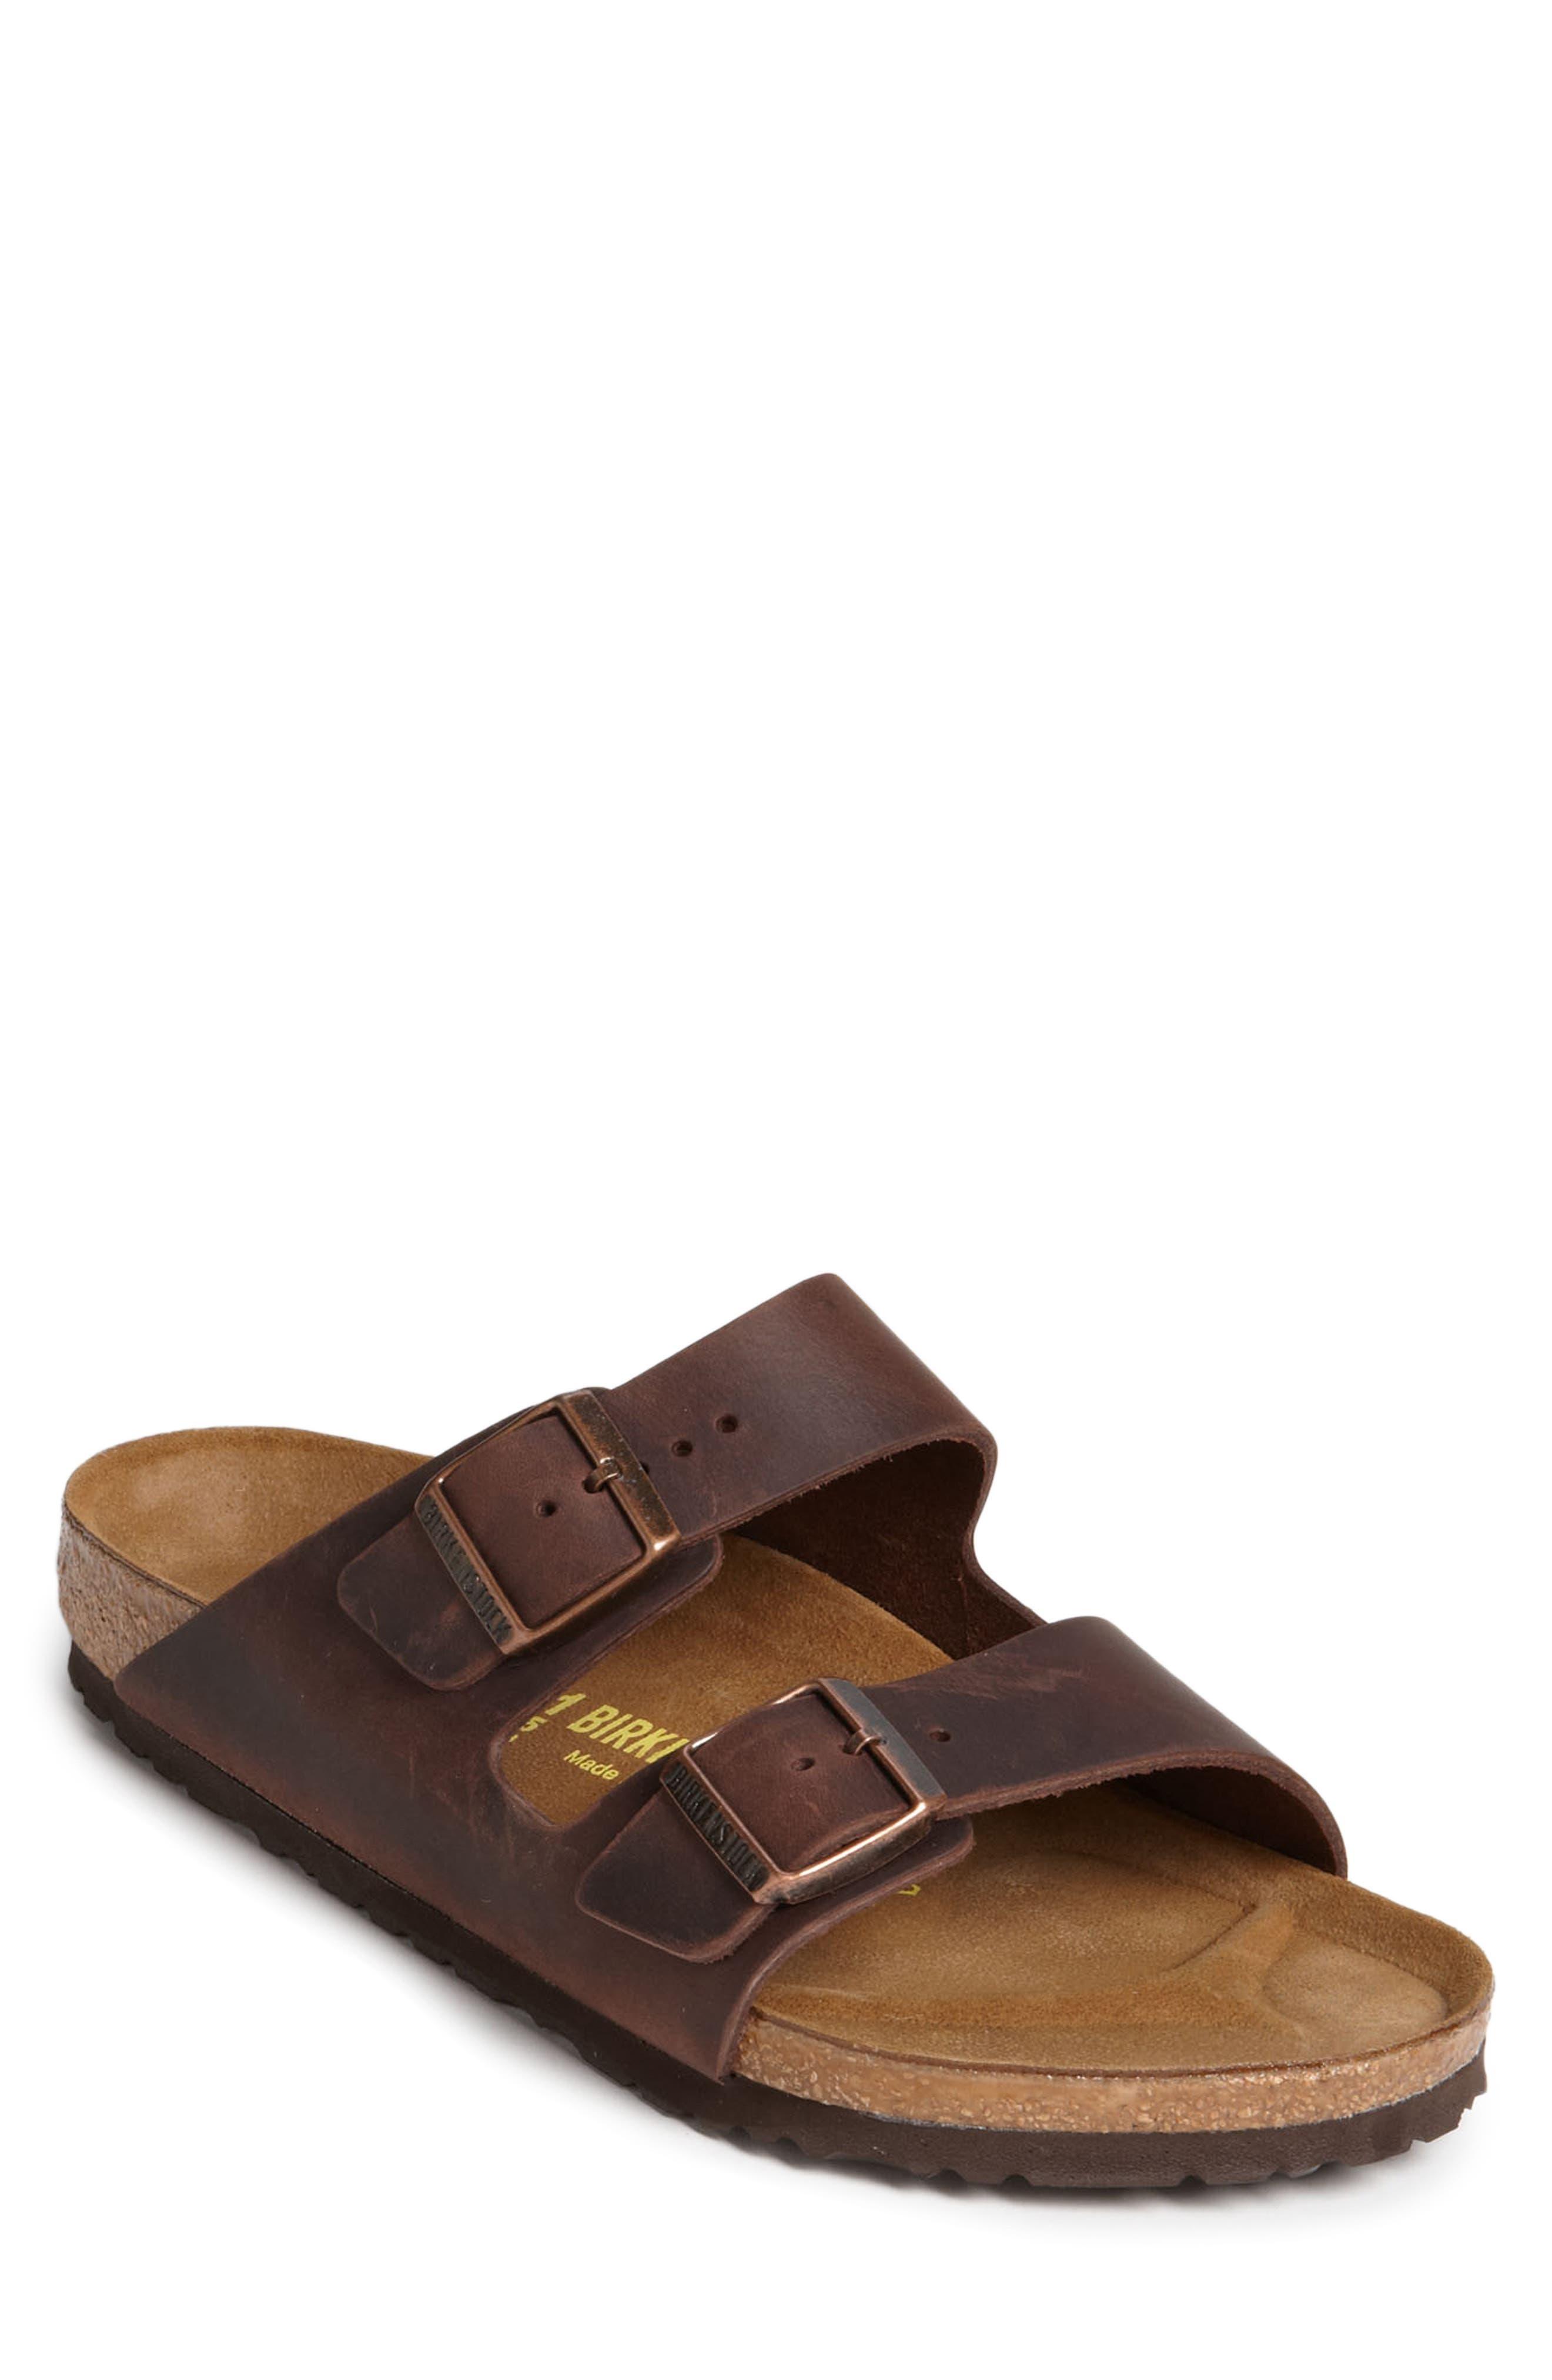 BIRKENSTOCK, Arizona Slide Sandal, Main thumbnail 1, color, HABANA OILED BROWN